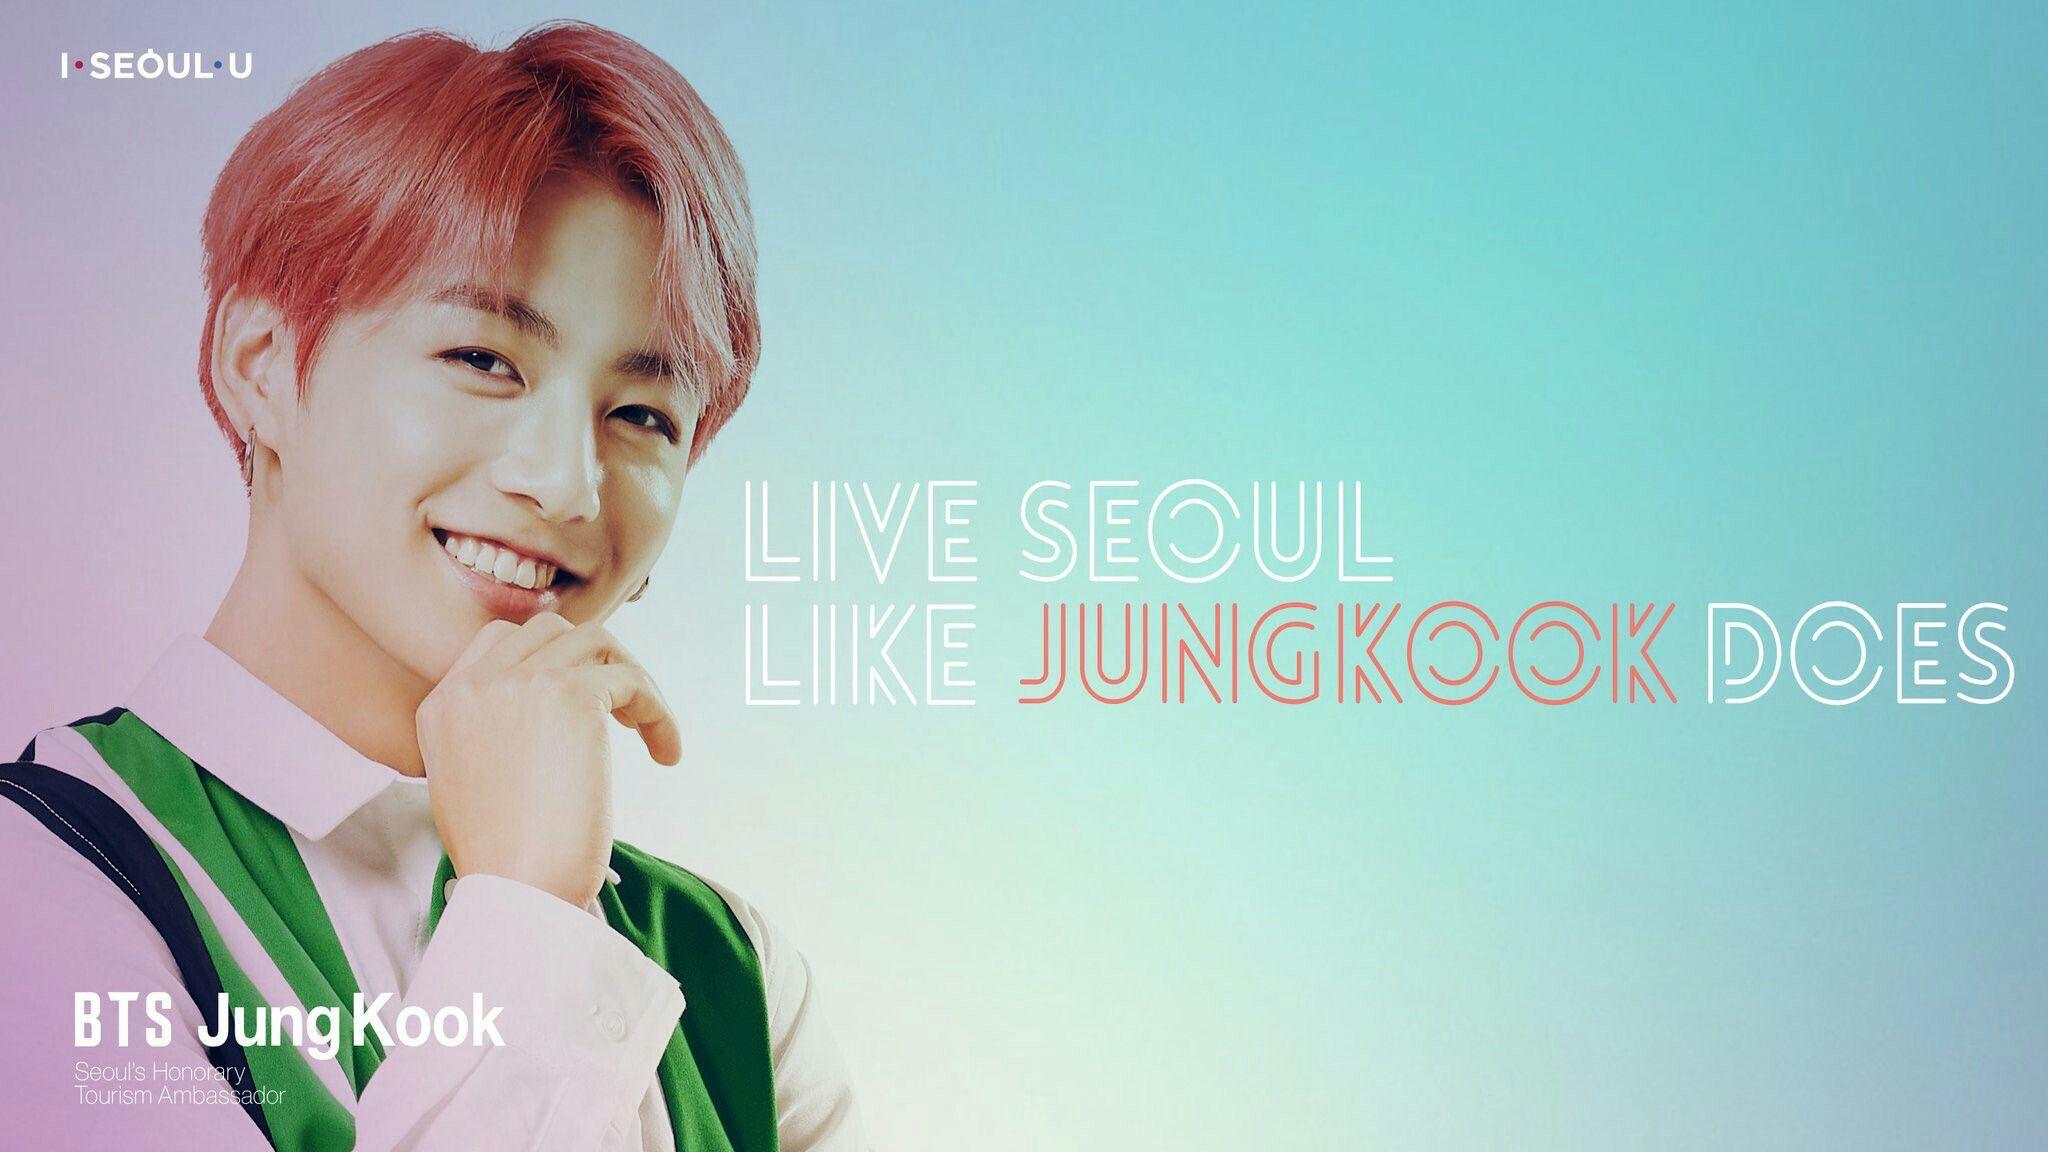 Pc Wallpaper Live Seoul Like I Do Liveseoullikebtsdoes Myseoulplaylist Jk Jungkook Bts Jungkook Bts Lyric